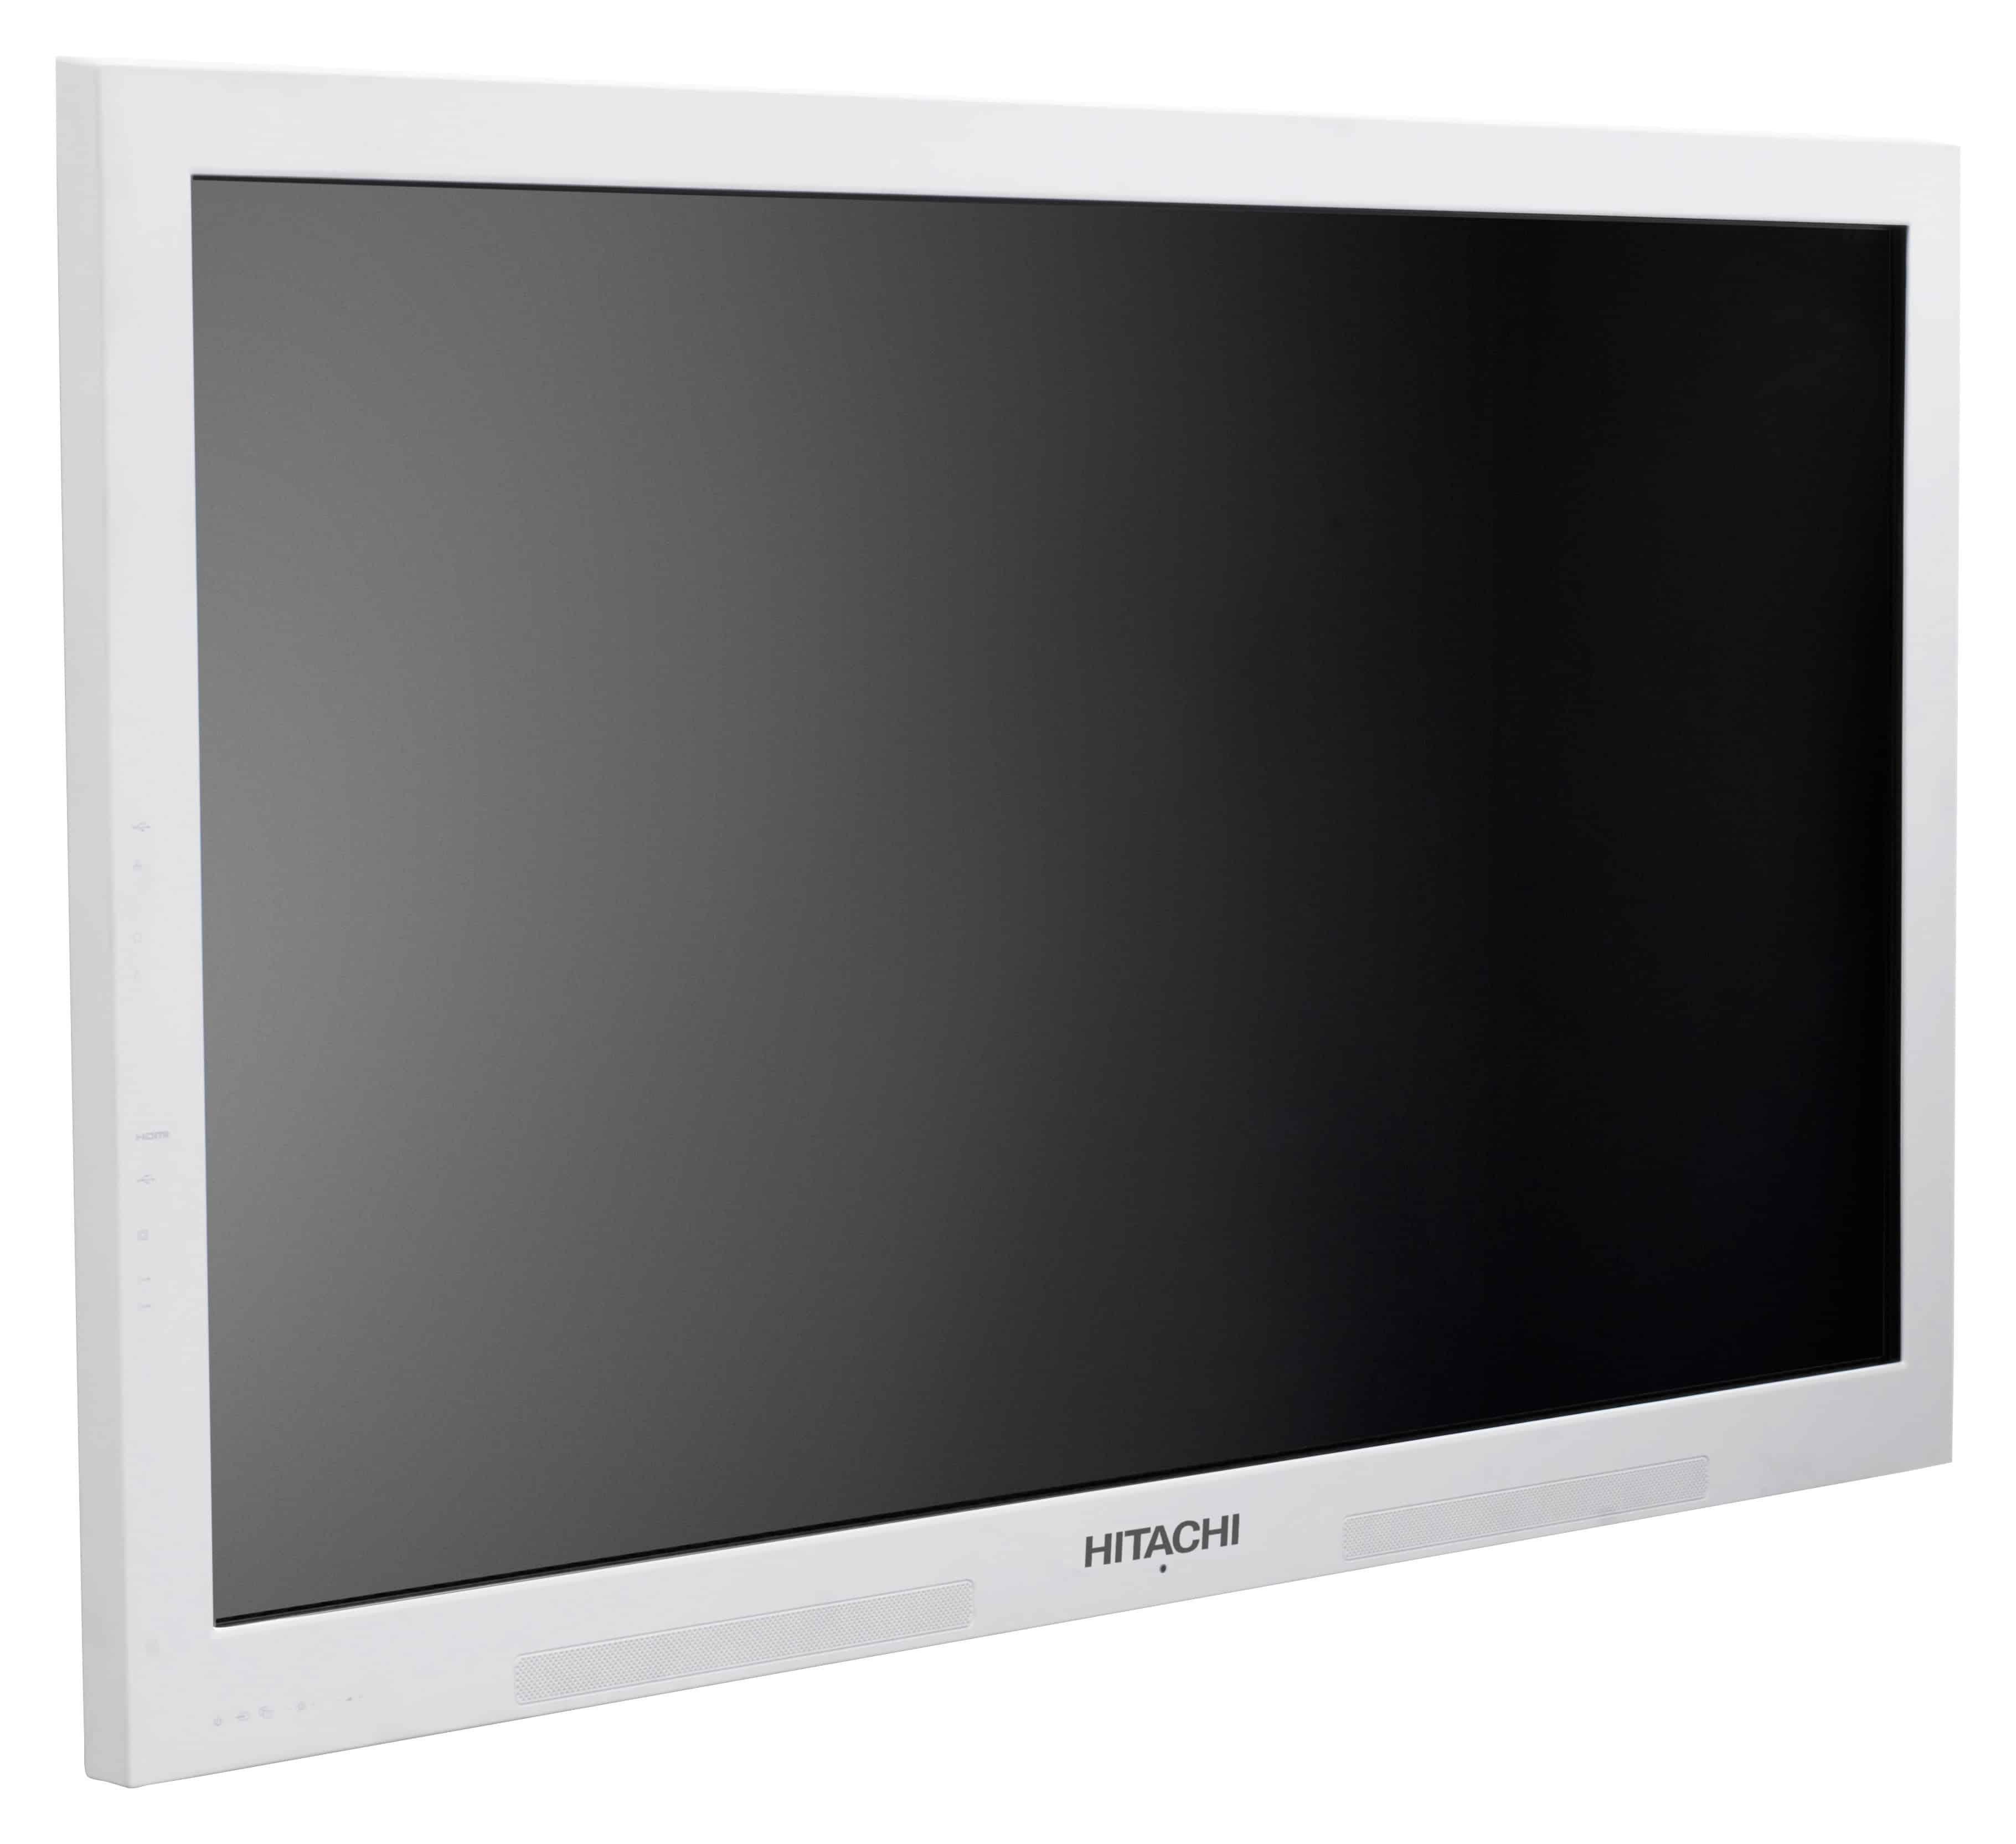 Monitor Interactivo Hitachi FHD6500